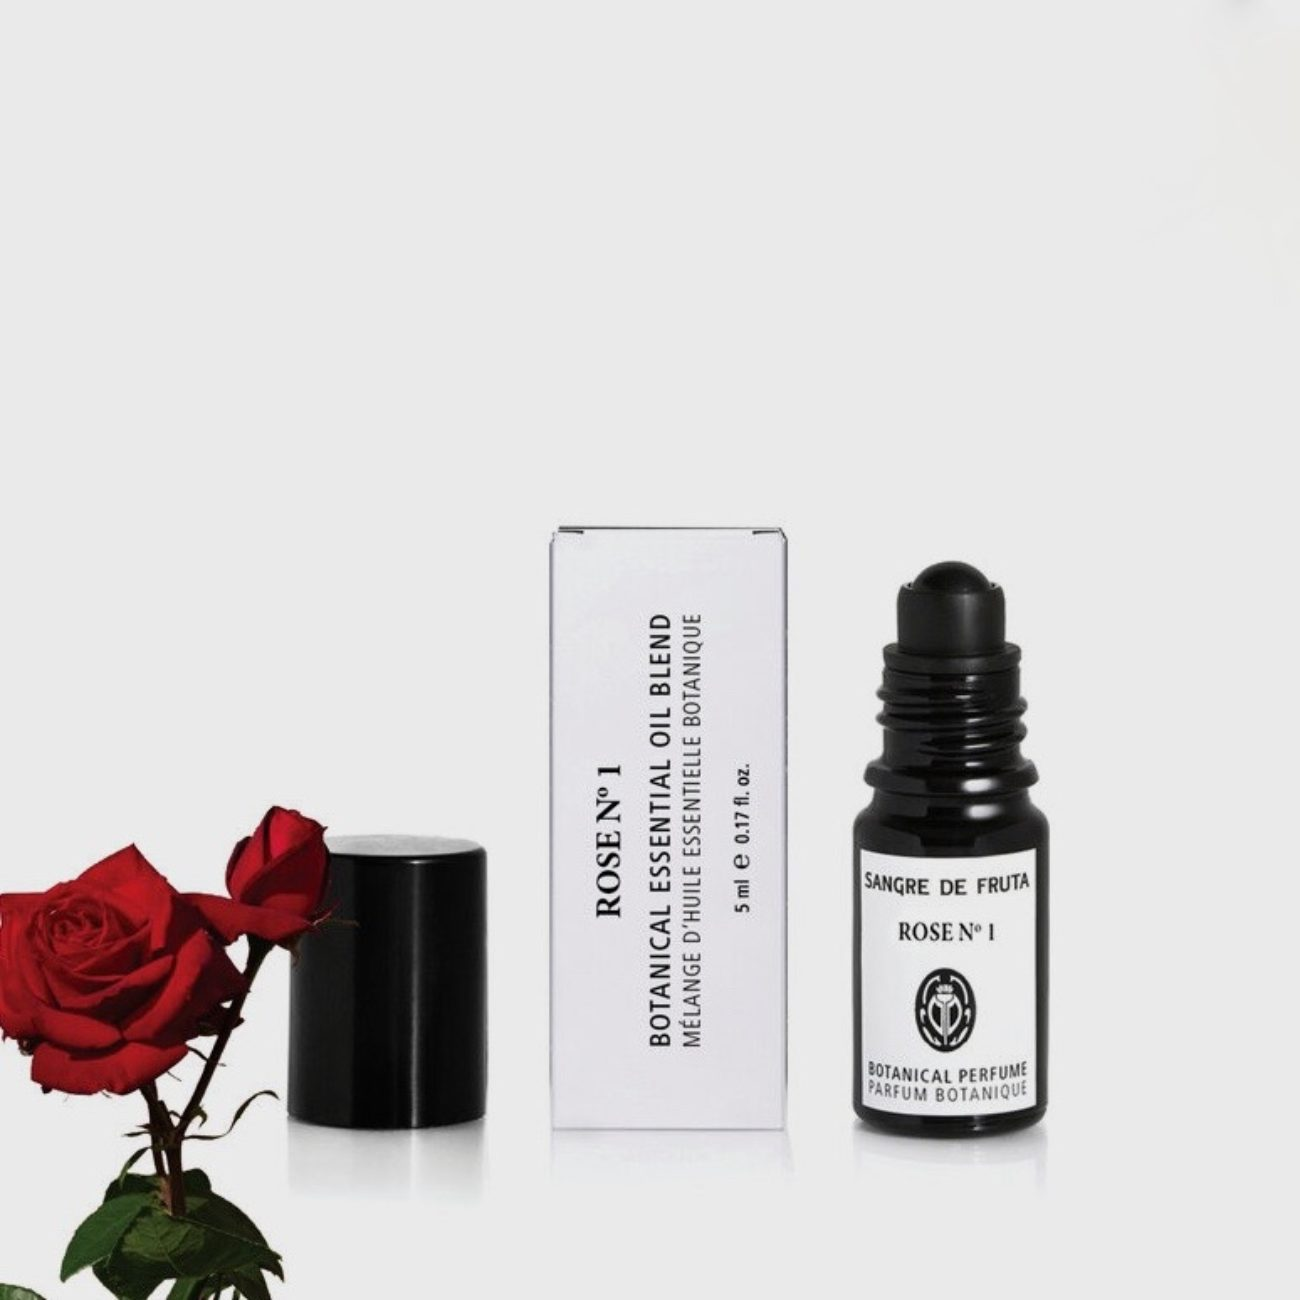 Sangre De Fruta Roll On Essential Oil Perfume, Rose No. 1